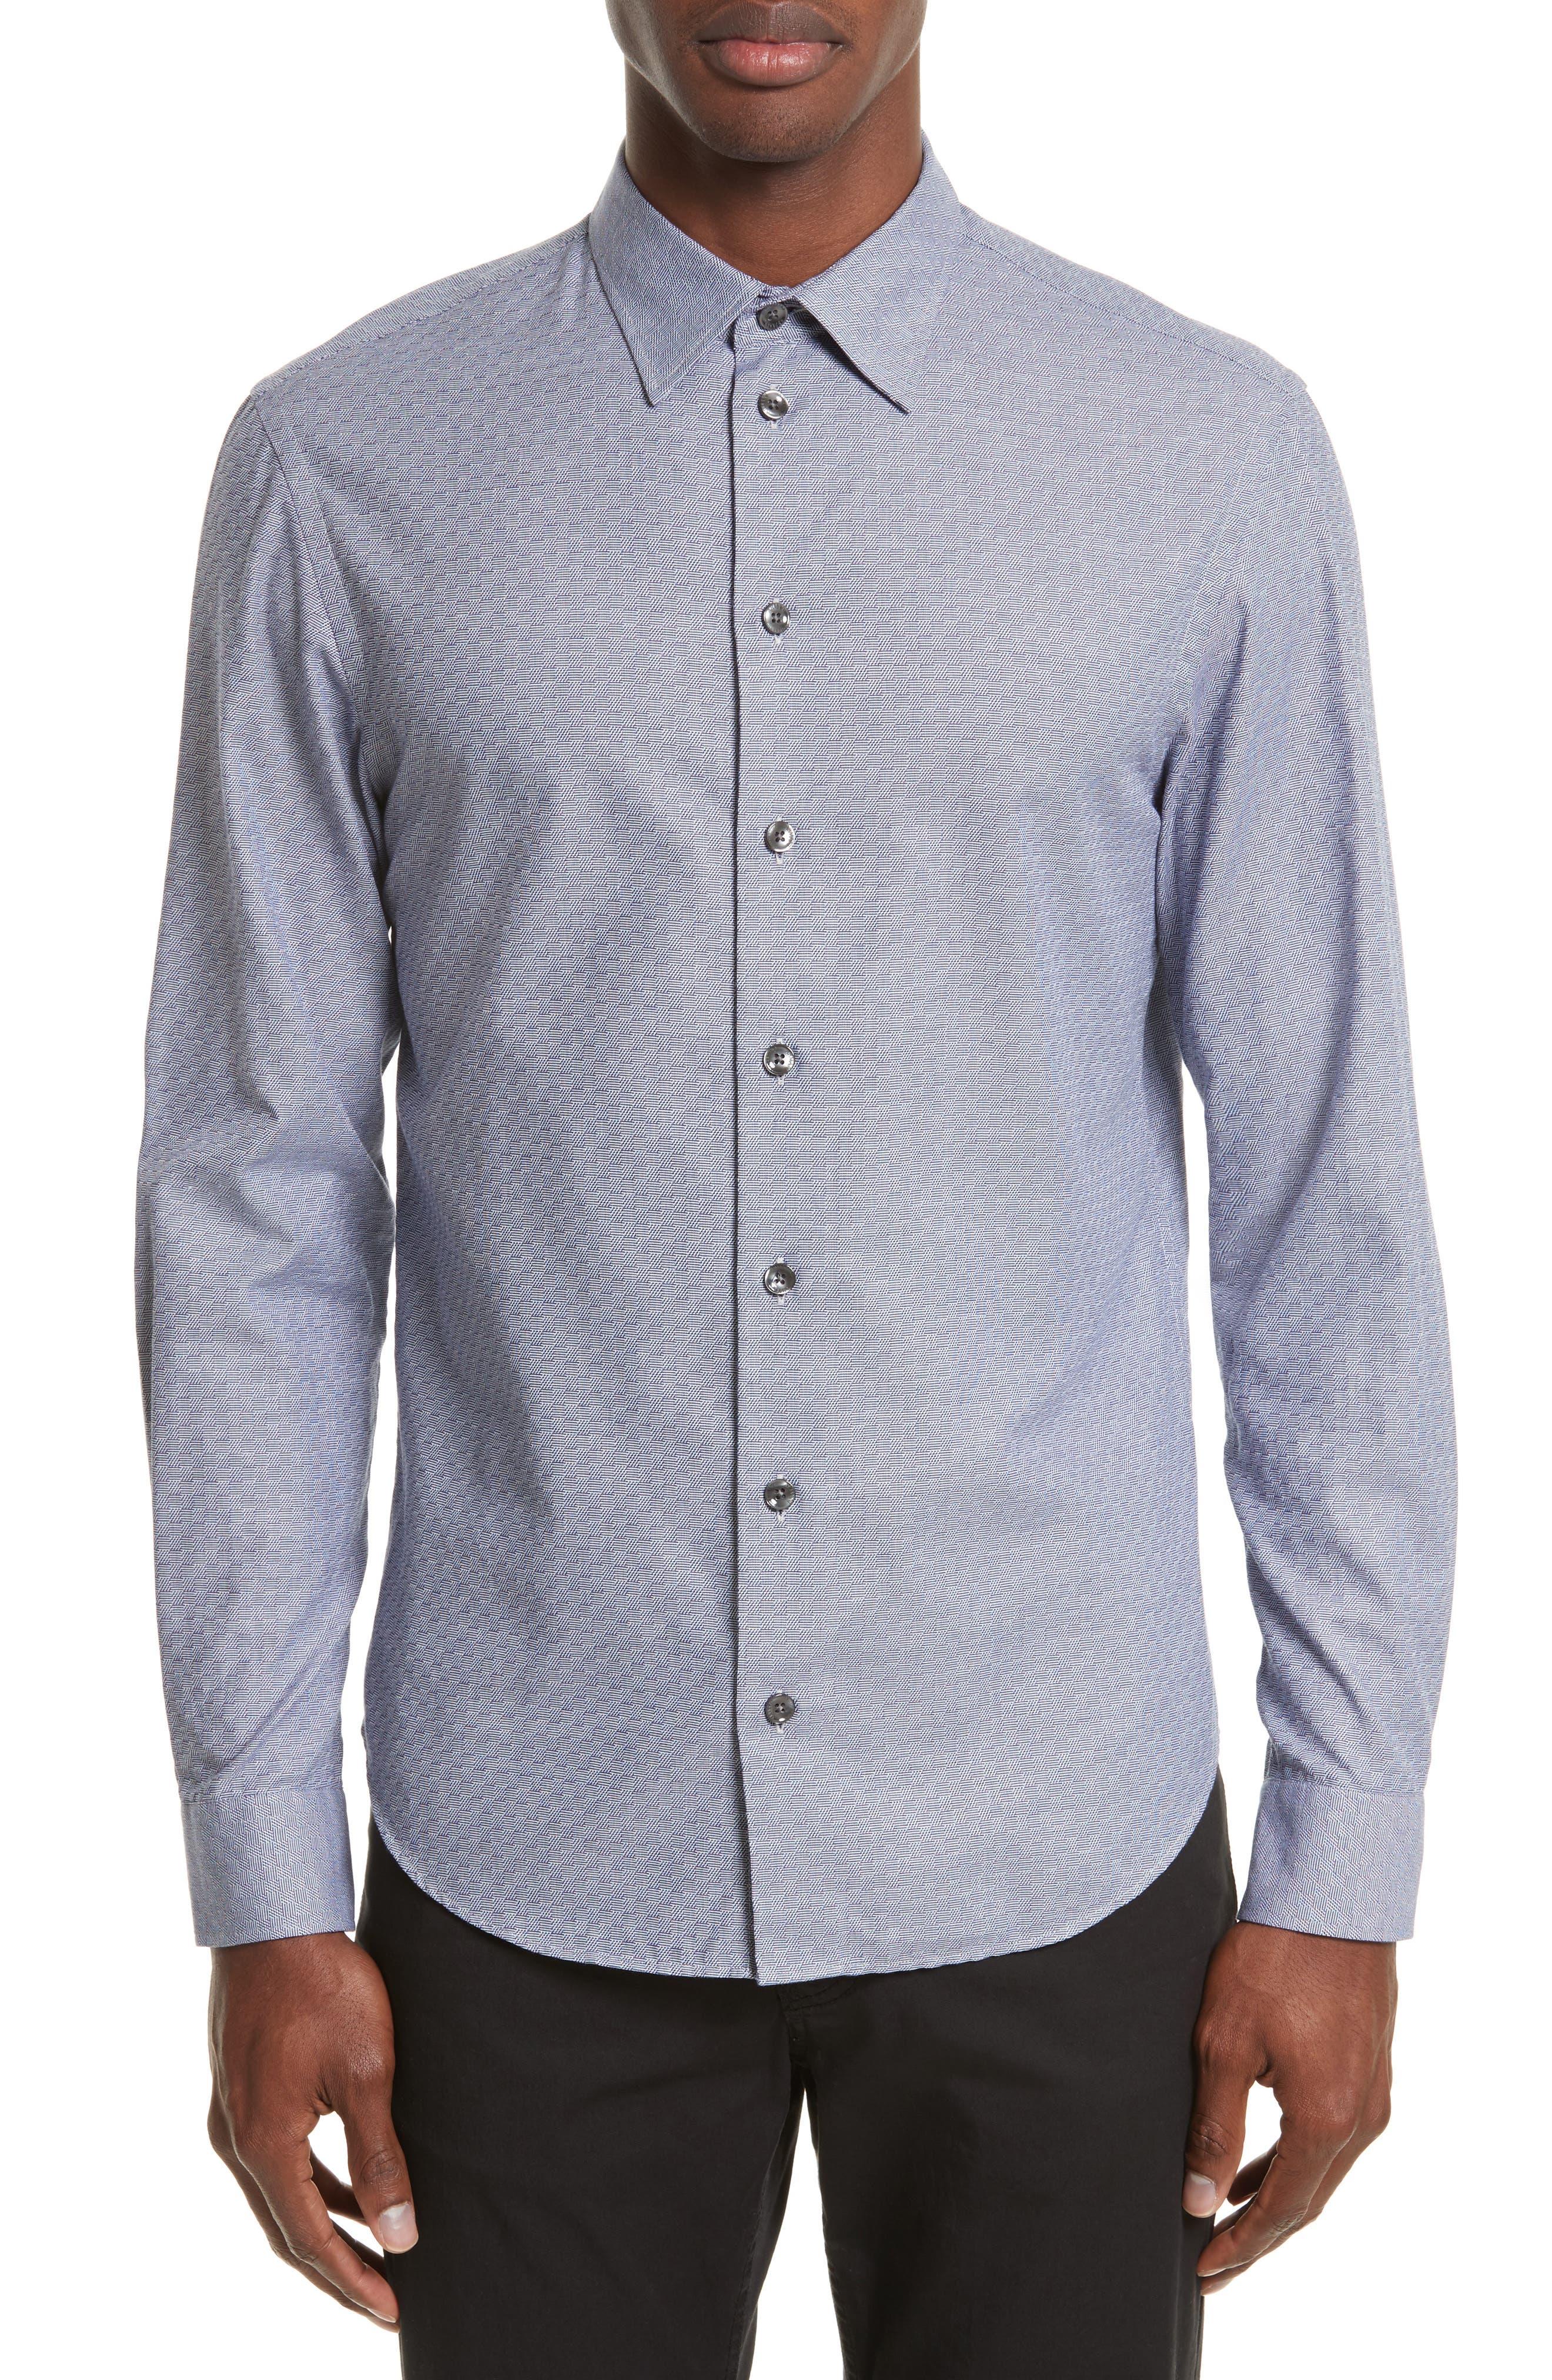 Alternate Image 1 Selected - Armani Collezioni Geo Jacquard Sport Shirt